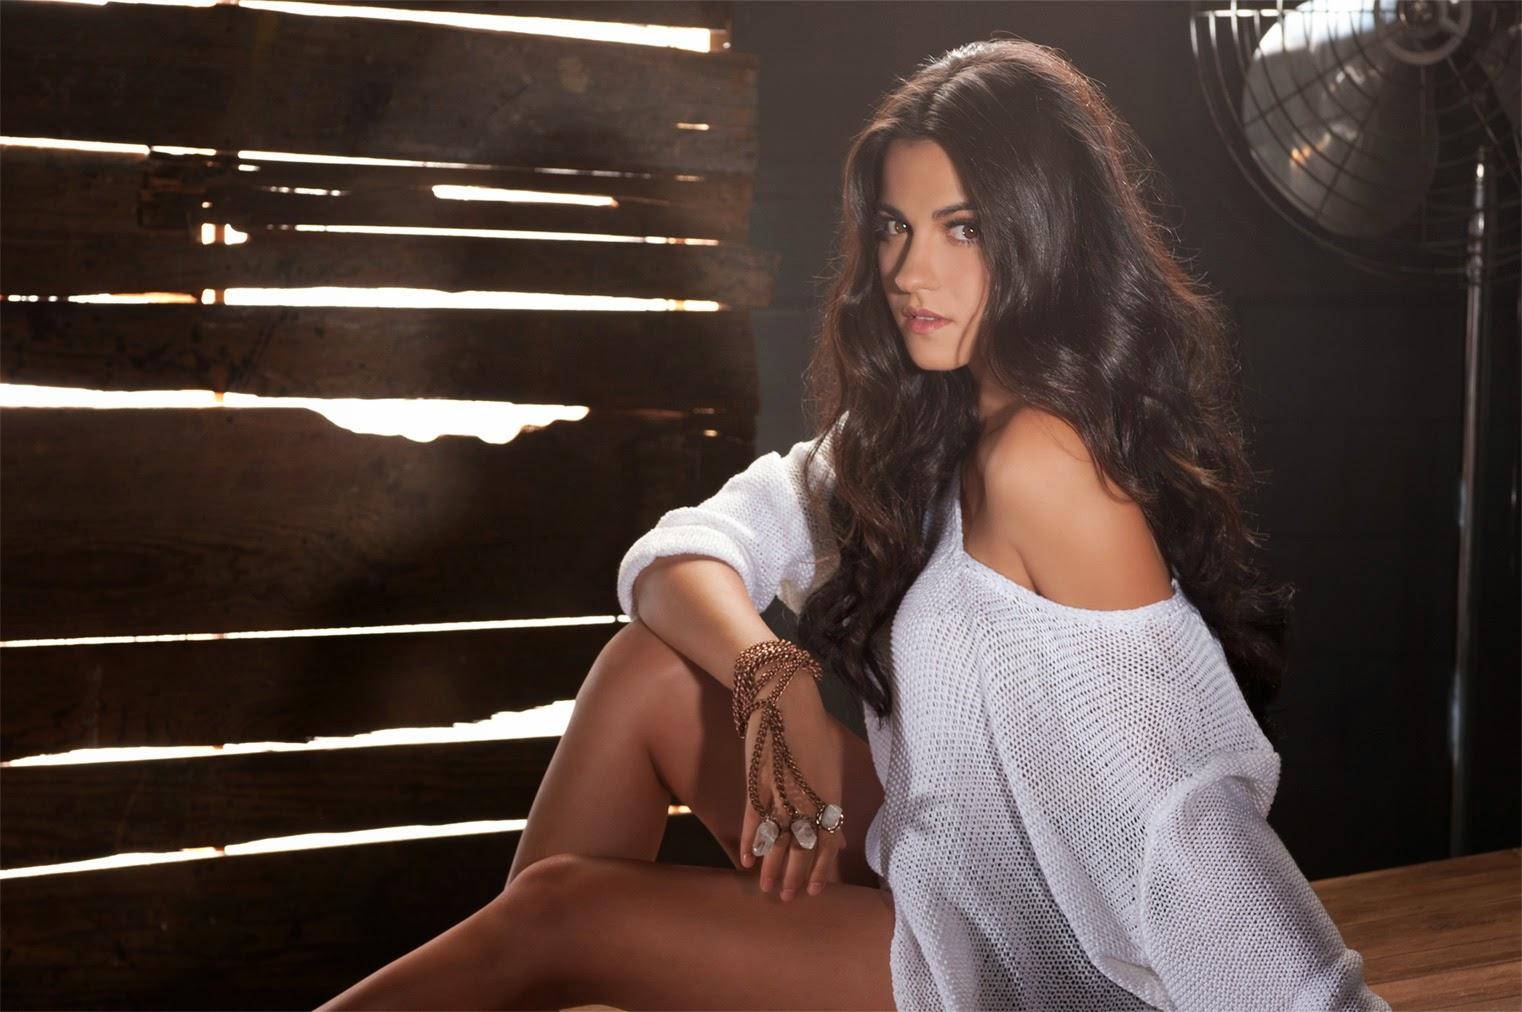 Elsa Benitez MEX 1997-1999,Anjali Hot videos Shoshana Bush,Ana Mulvoy-Ten (born 1992)